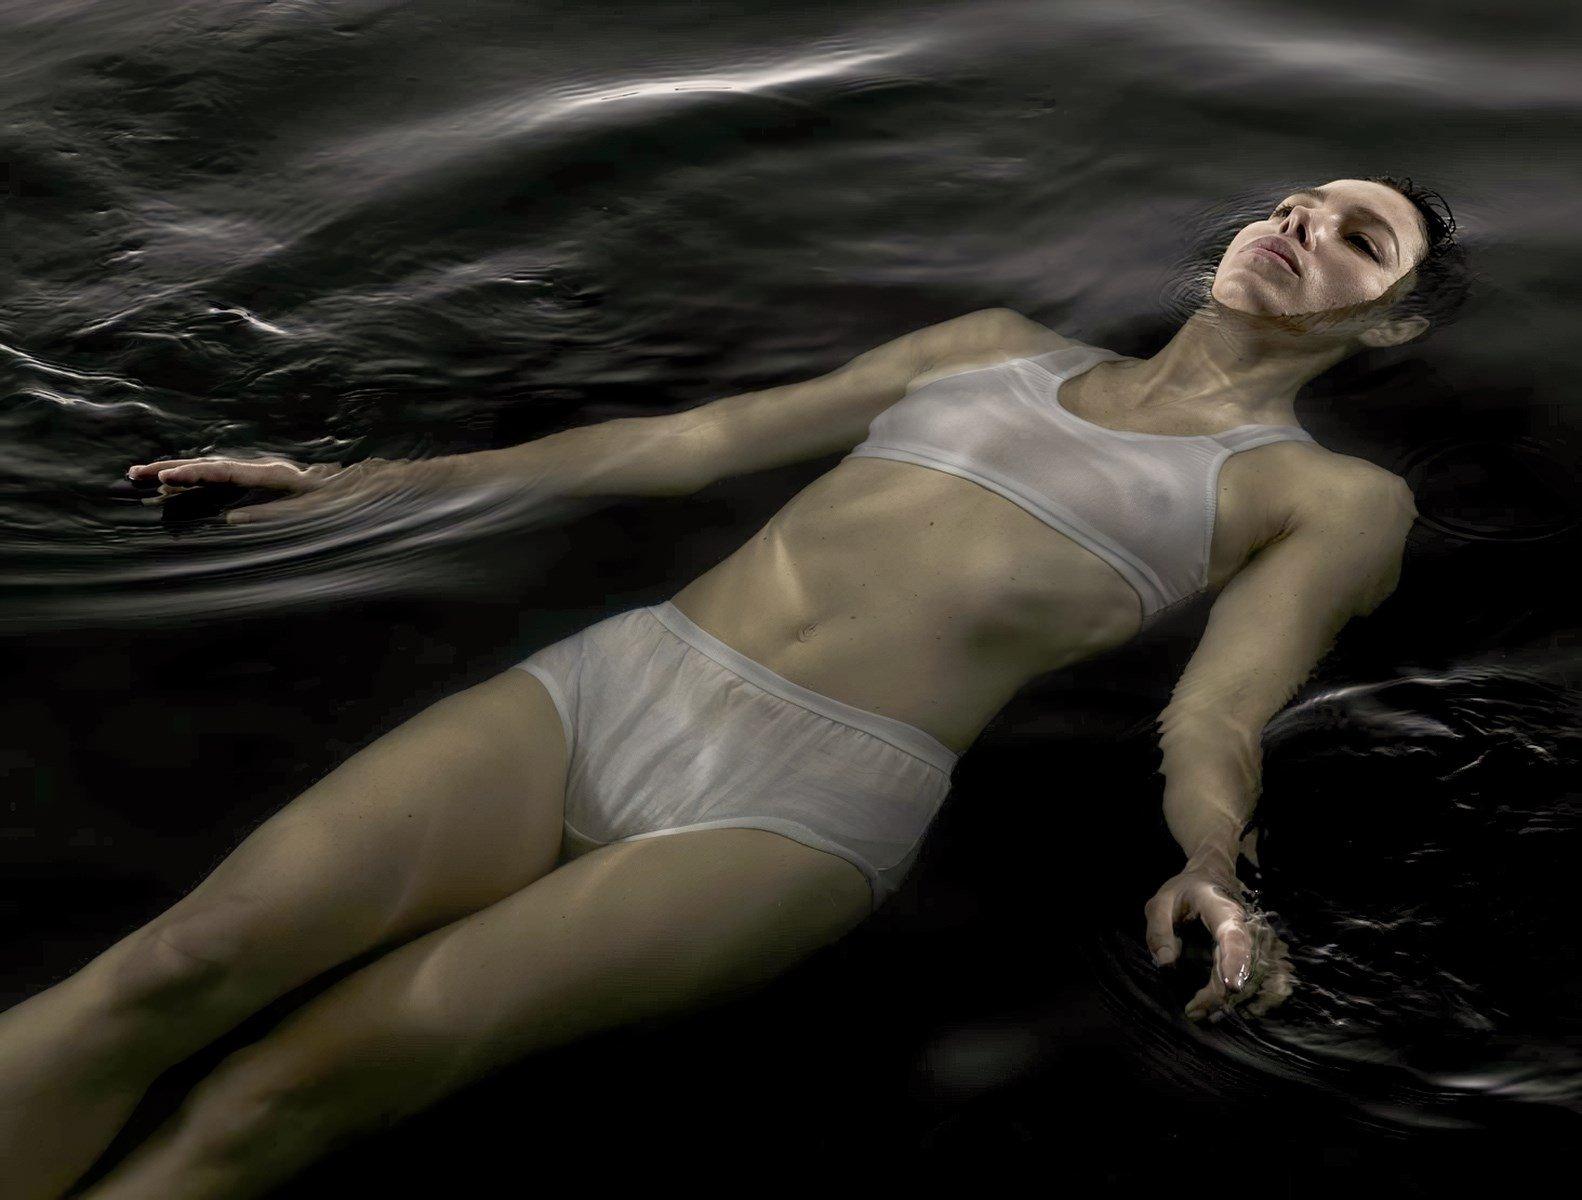 Jessica Biel Wet Nipples Photo Shoot